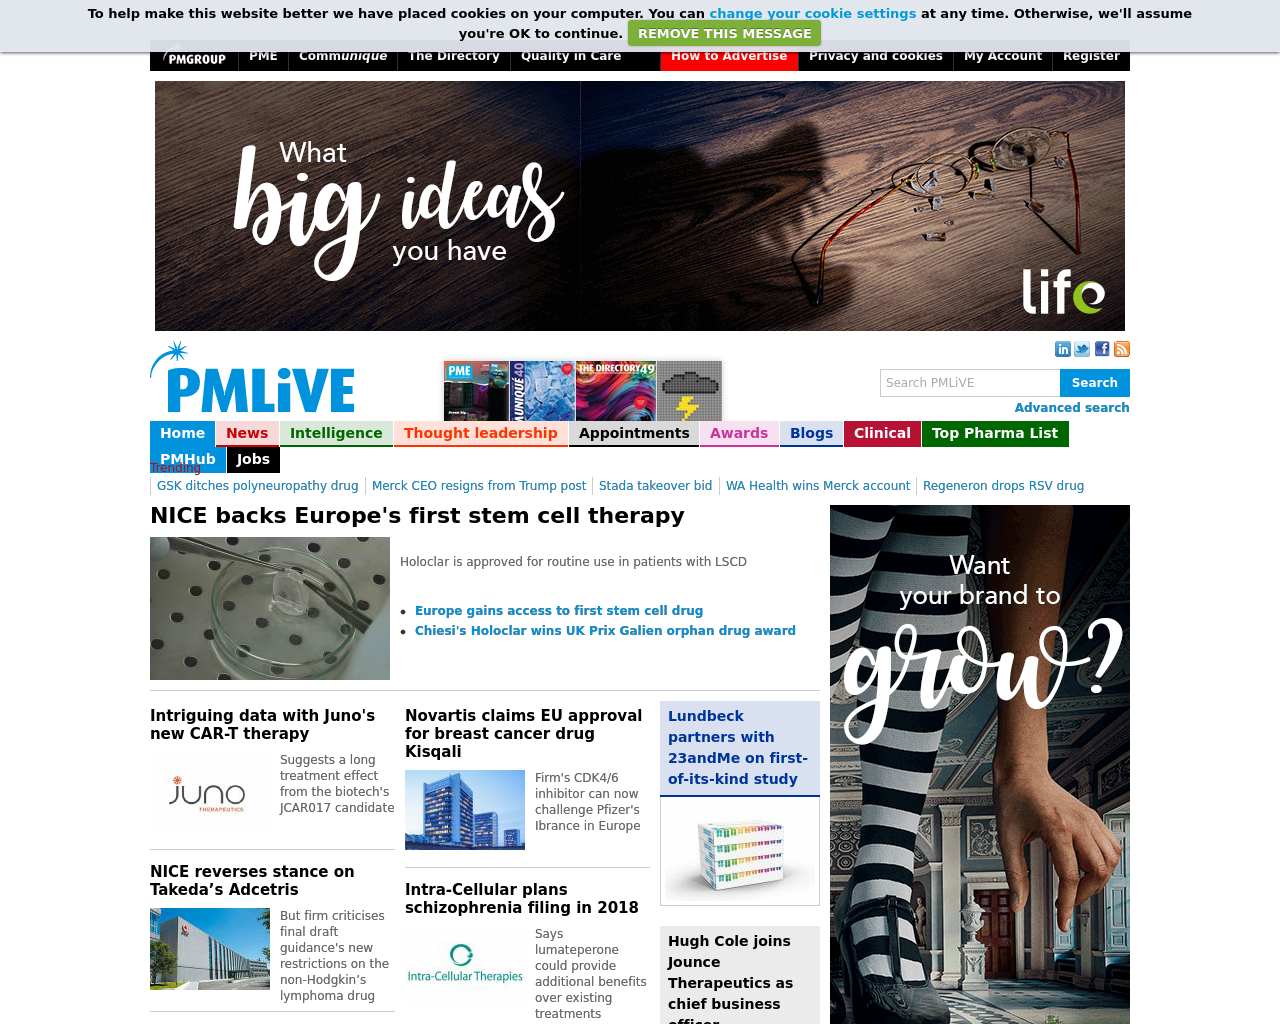 PMLive-Advertising-Reviews-Pricing